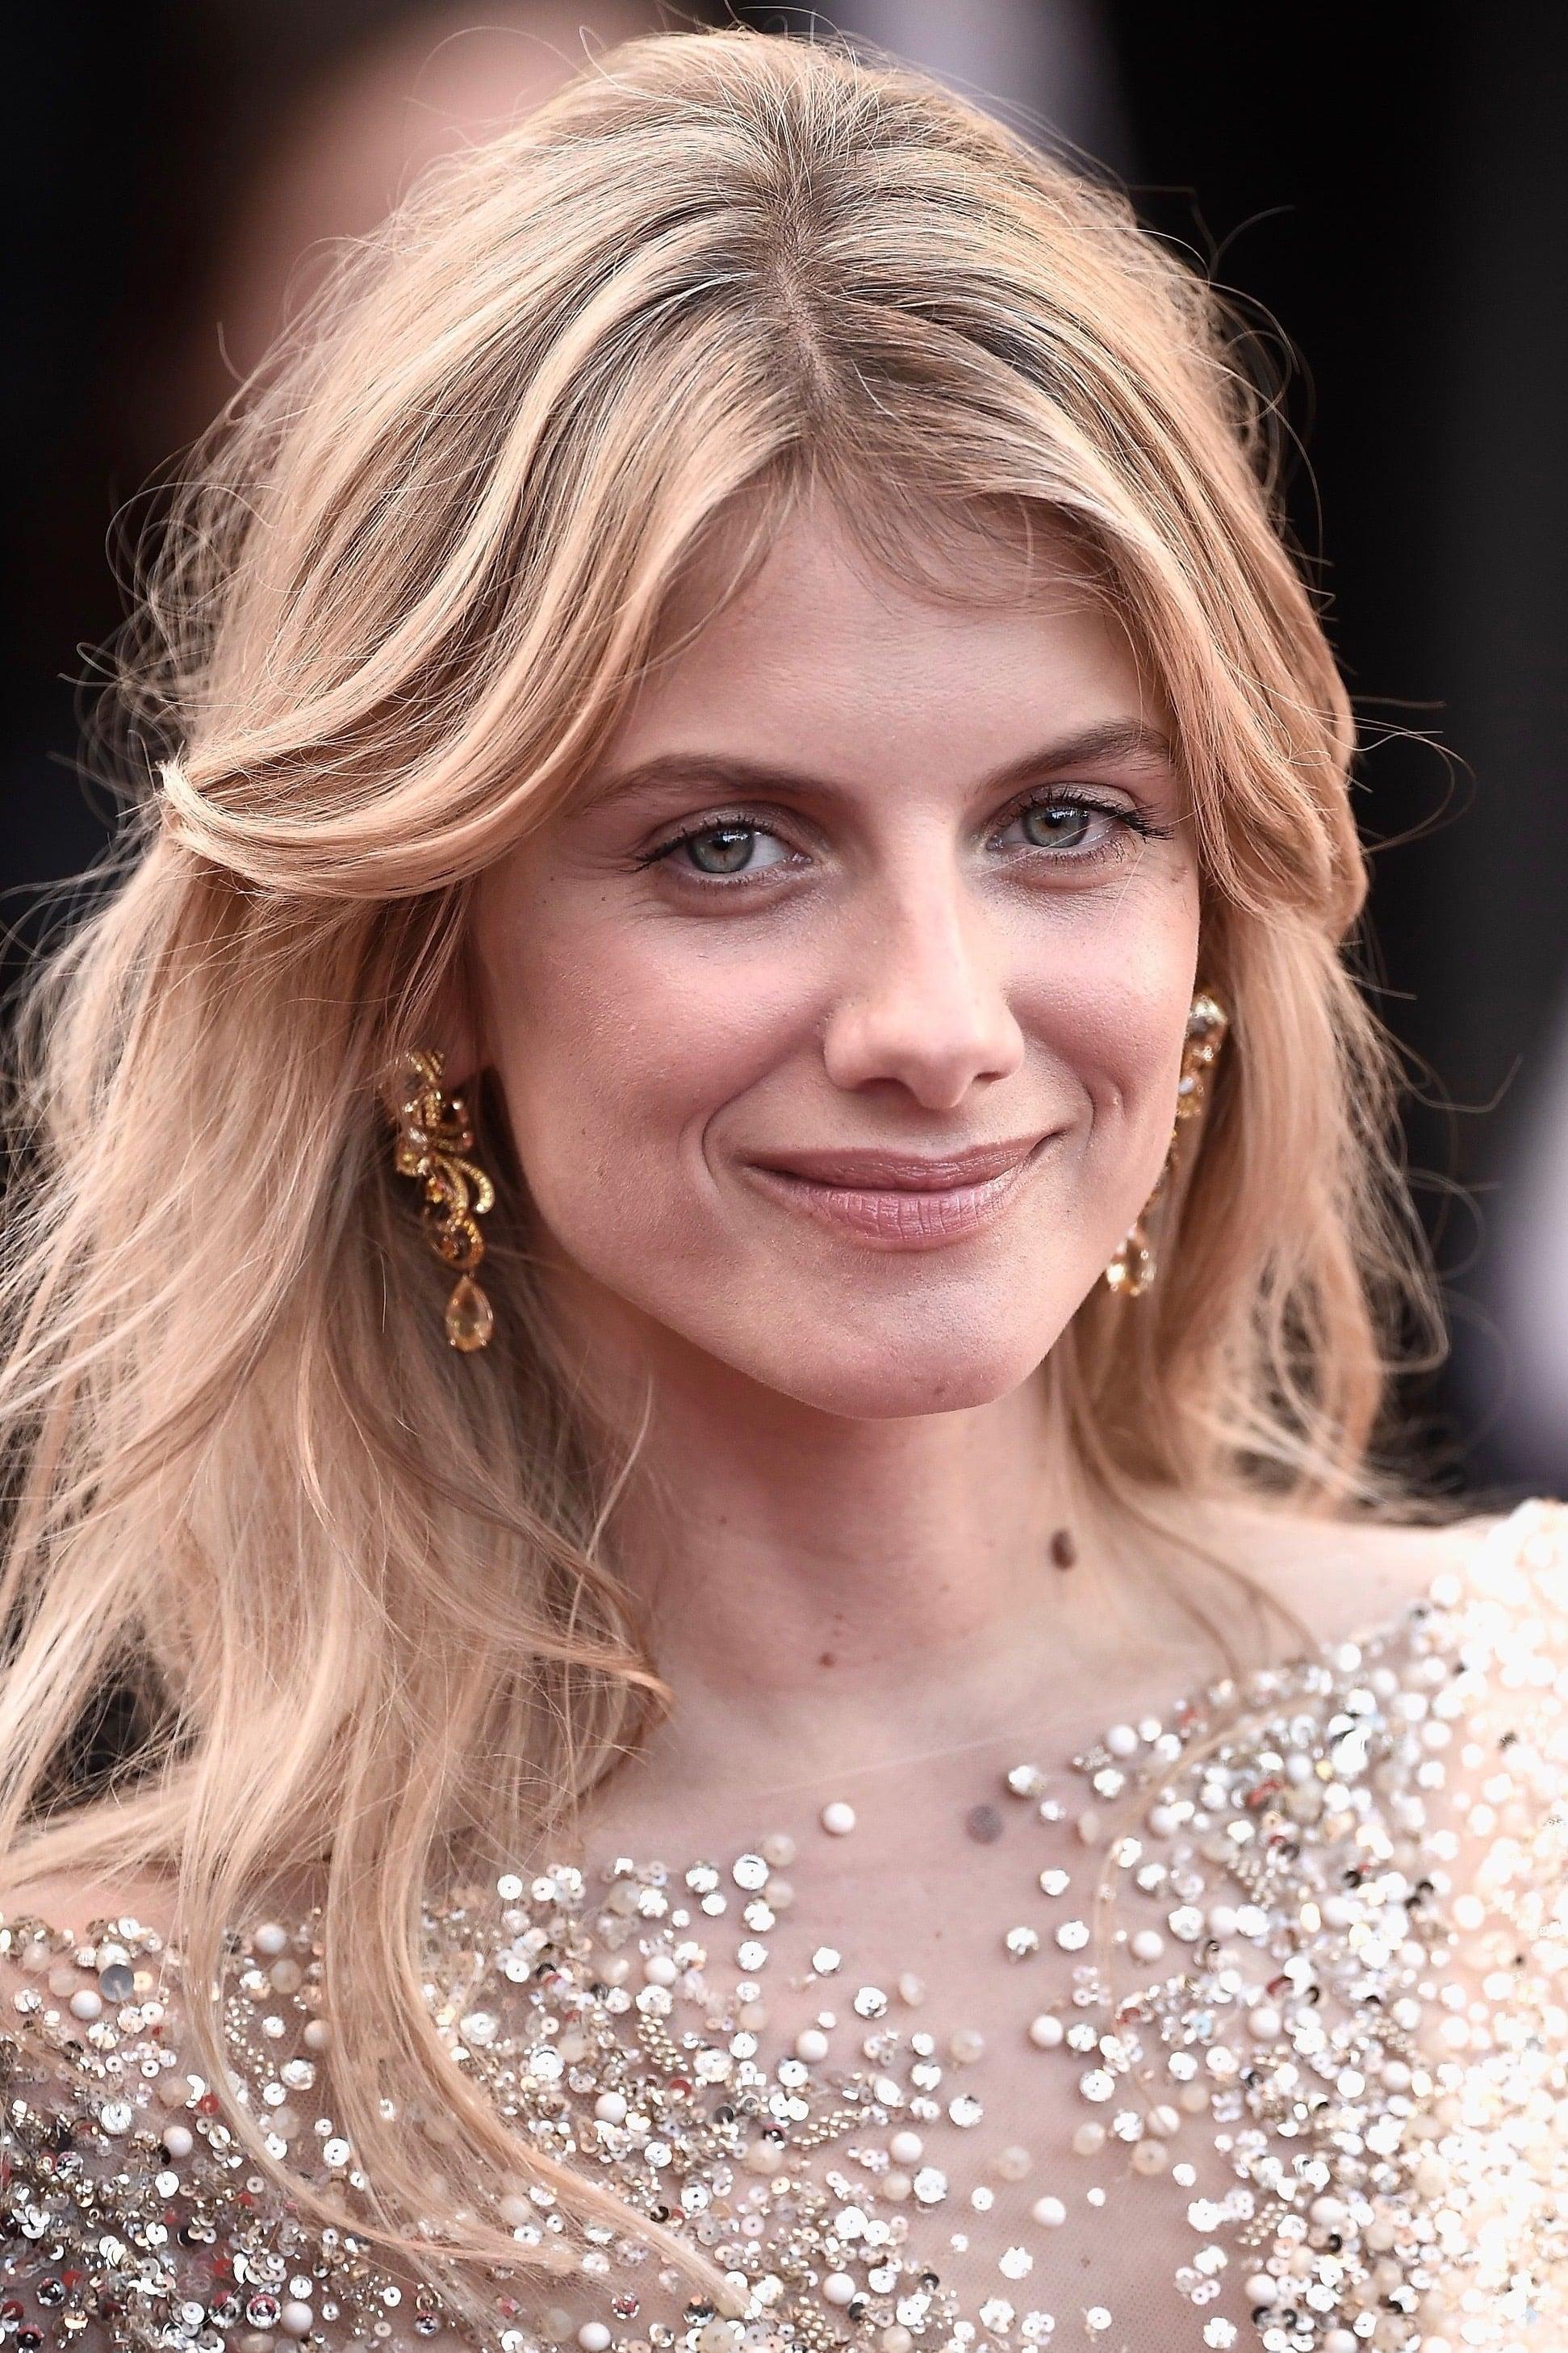 Mélanie Laurent - Profile Images — The Movie Database (TMDb)